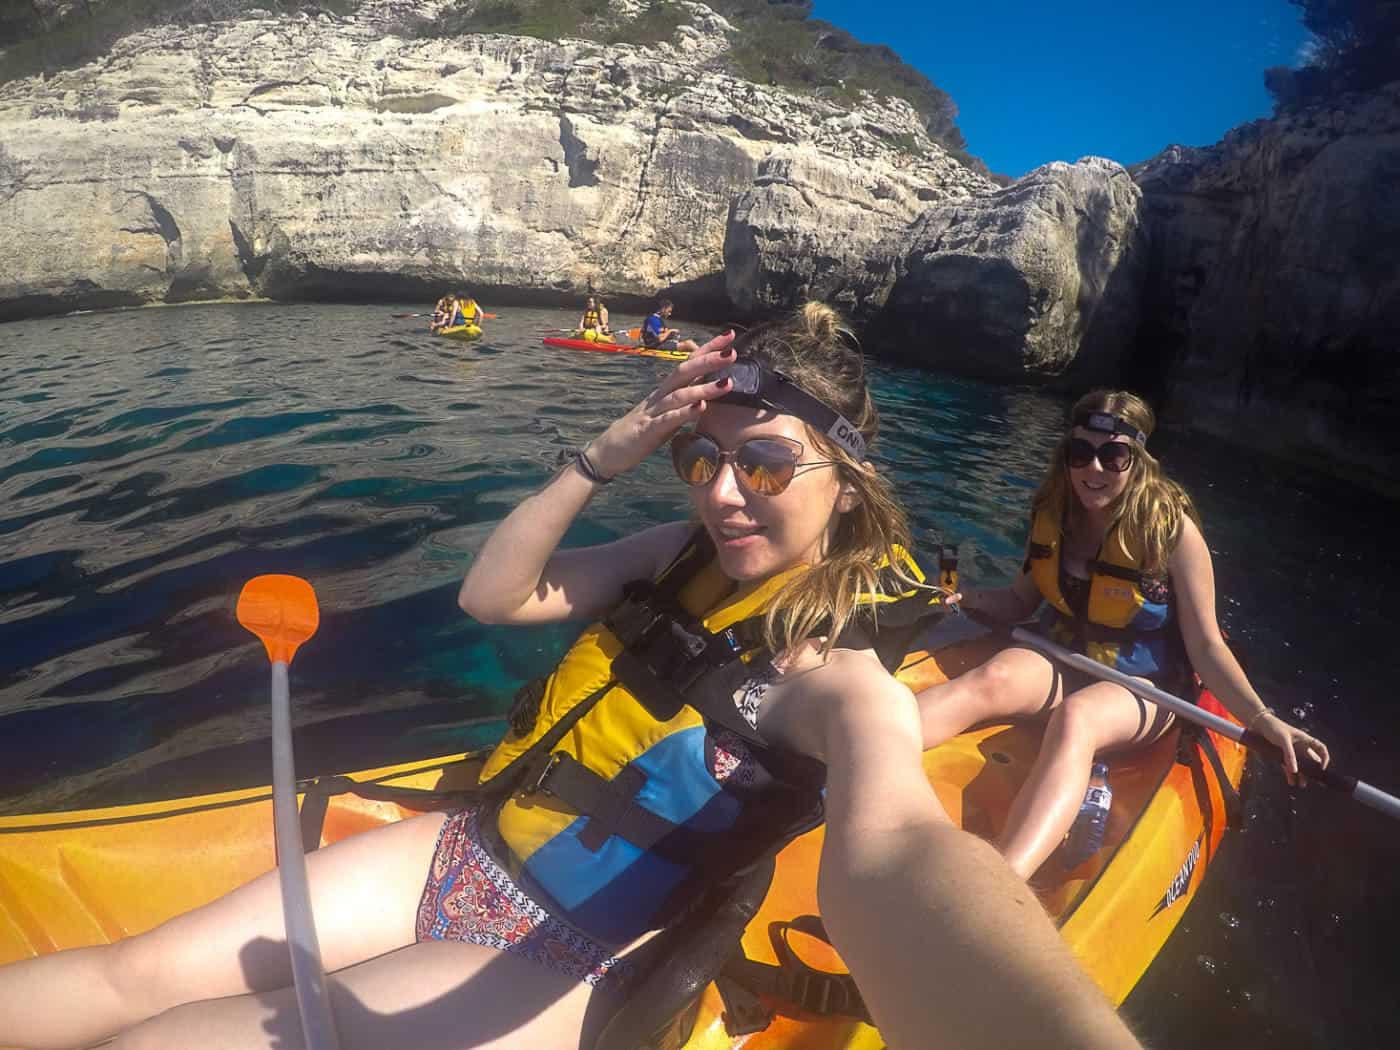 Kayaking in dragon cave menorca